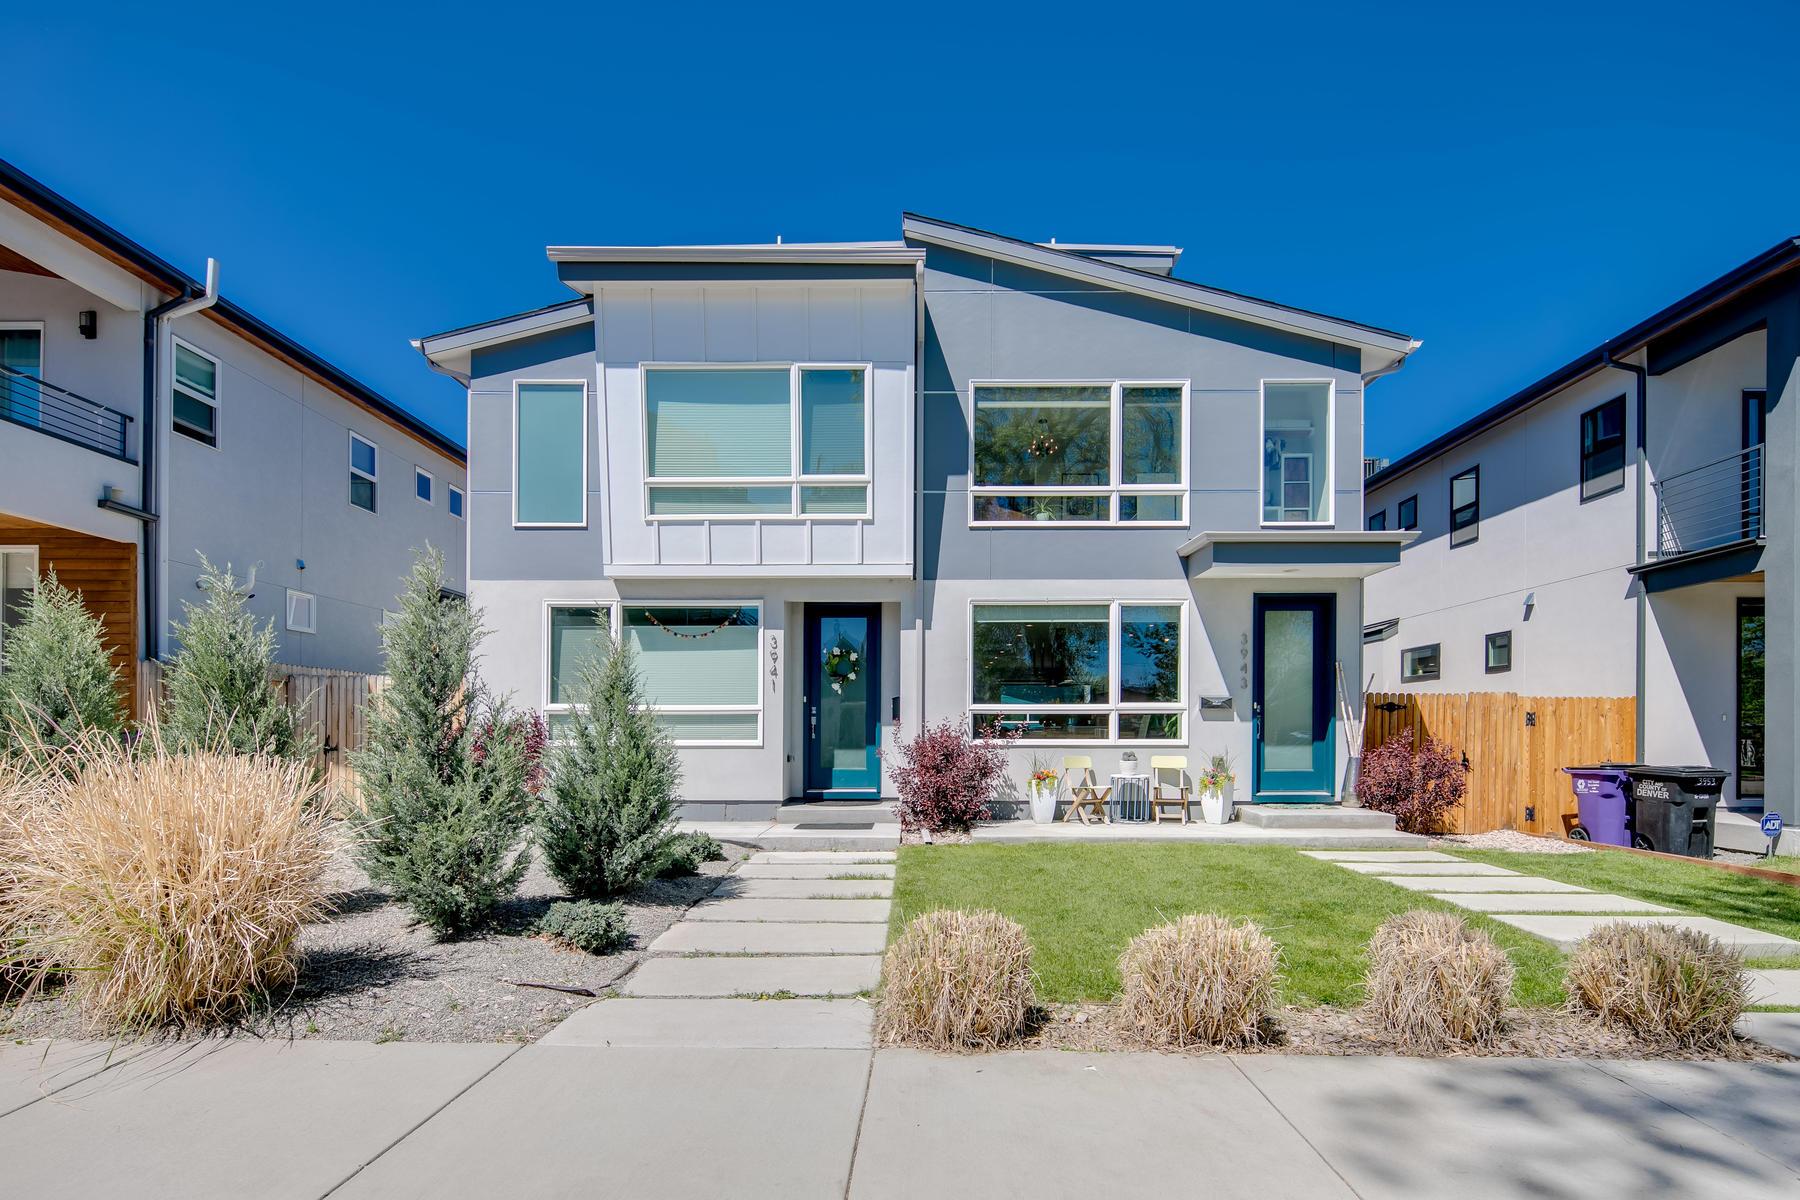 Single Family Home for Active at 3943 Utica Street 3943 Utica Street Denver, Colorado 80212 United States